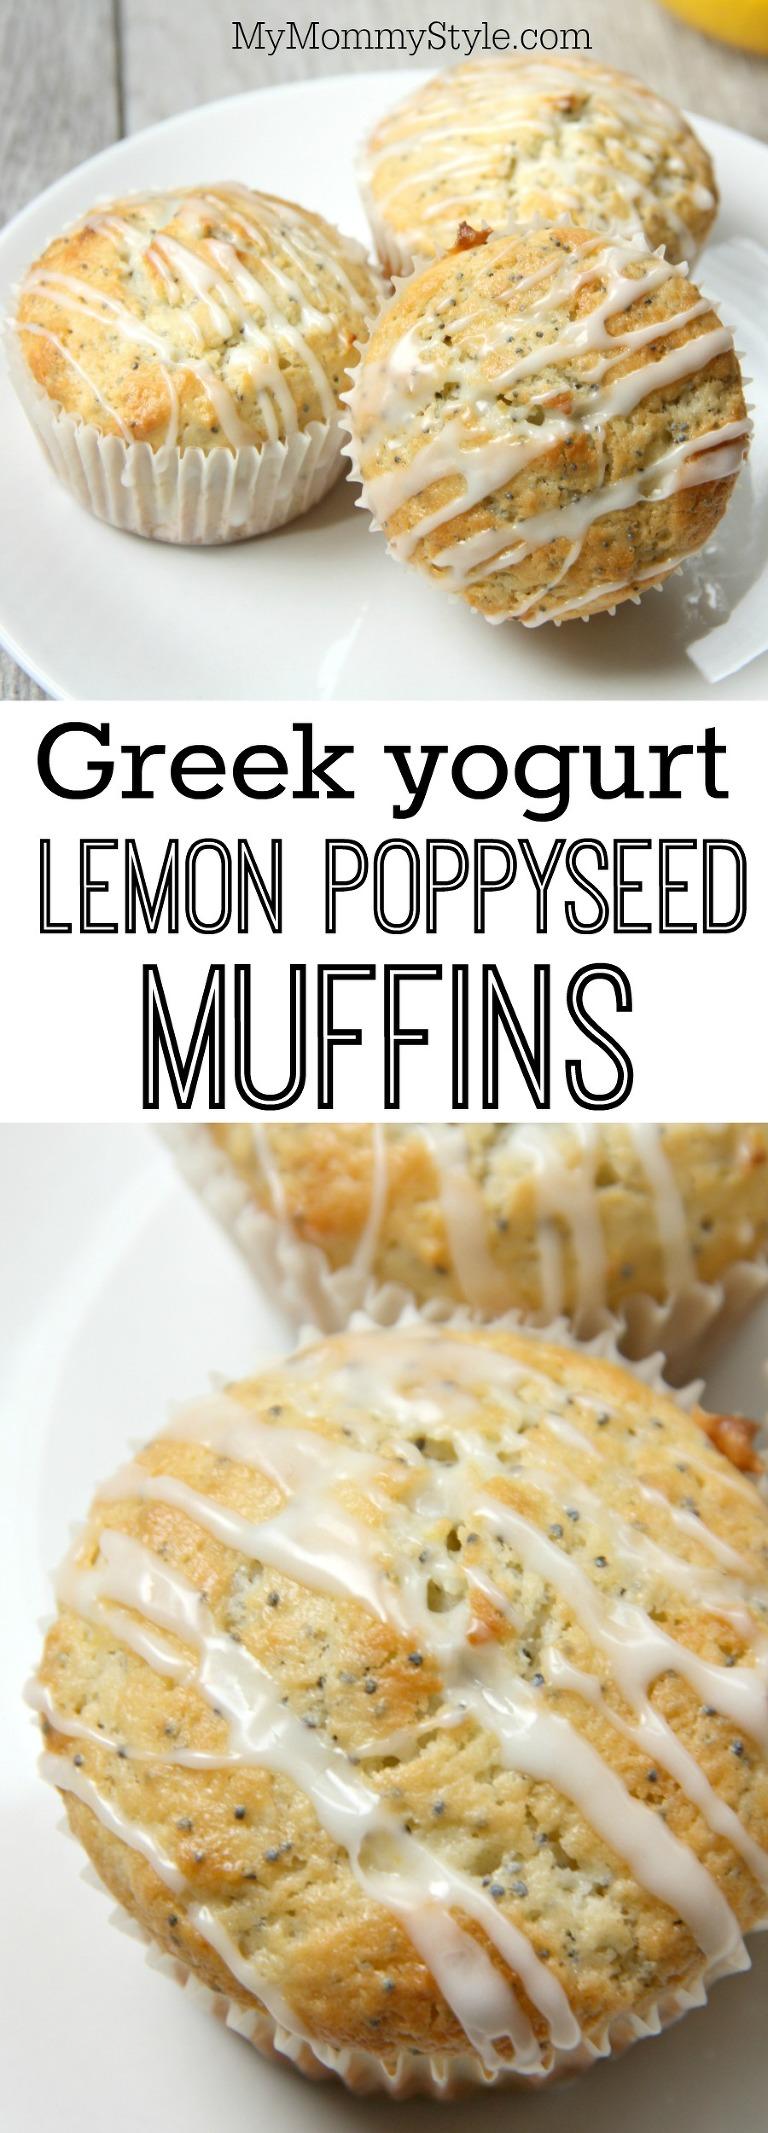 Greek yogurt lemon poppyseed muffins